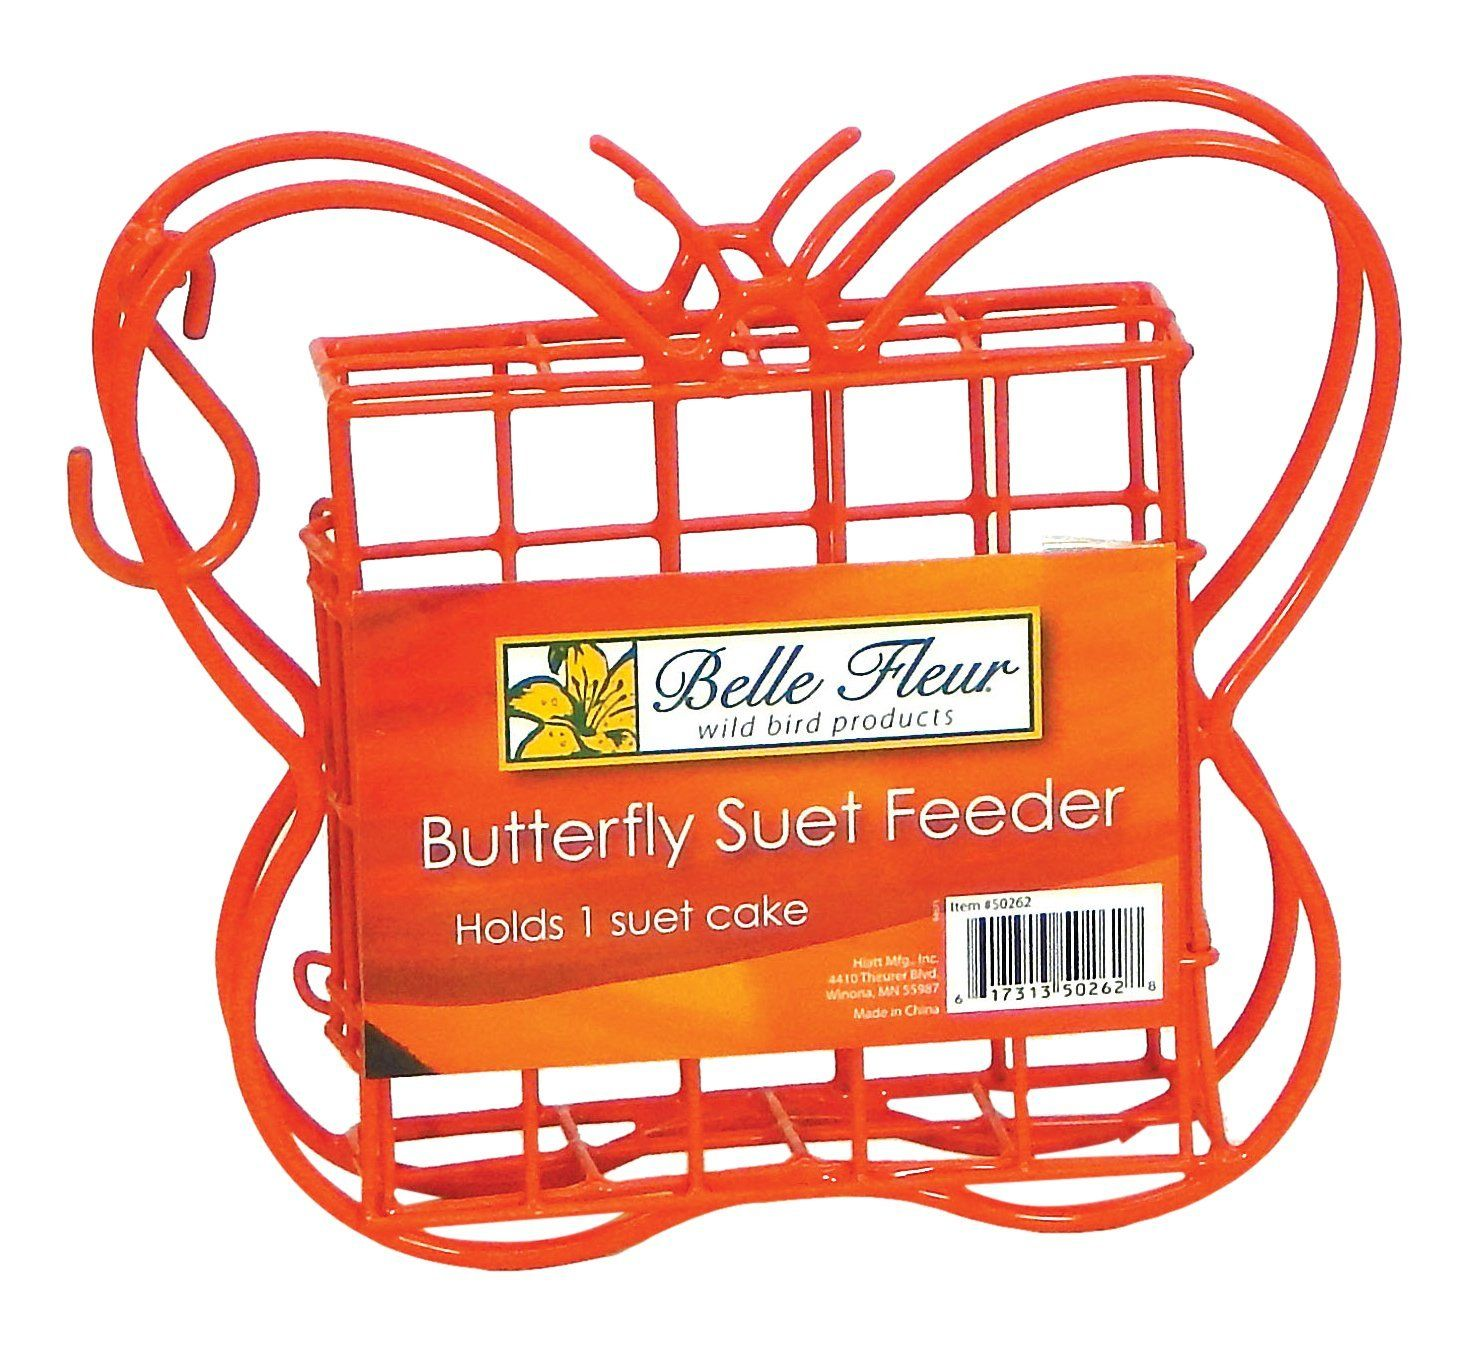 Belle fleur butterfly suet bird feeder red